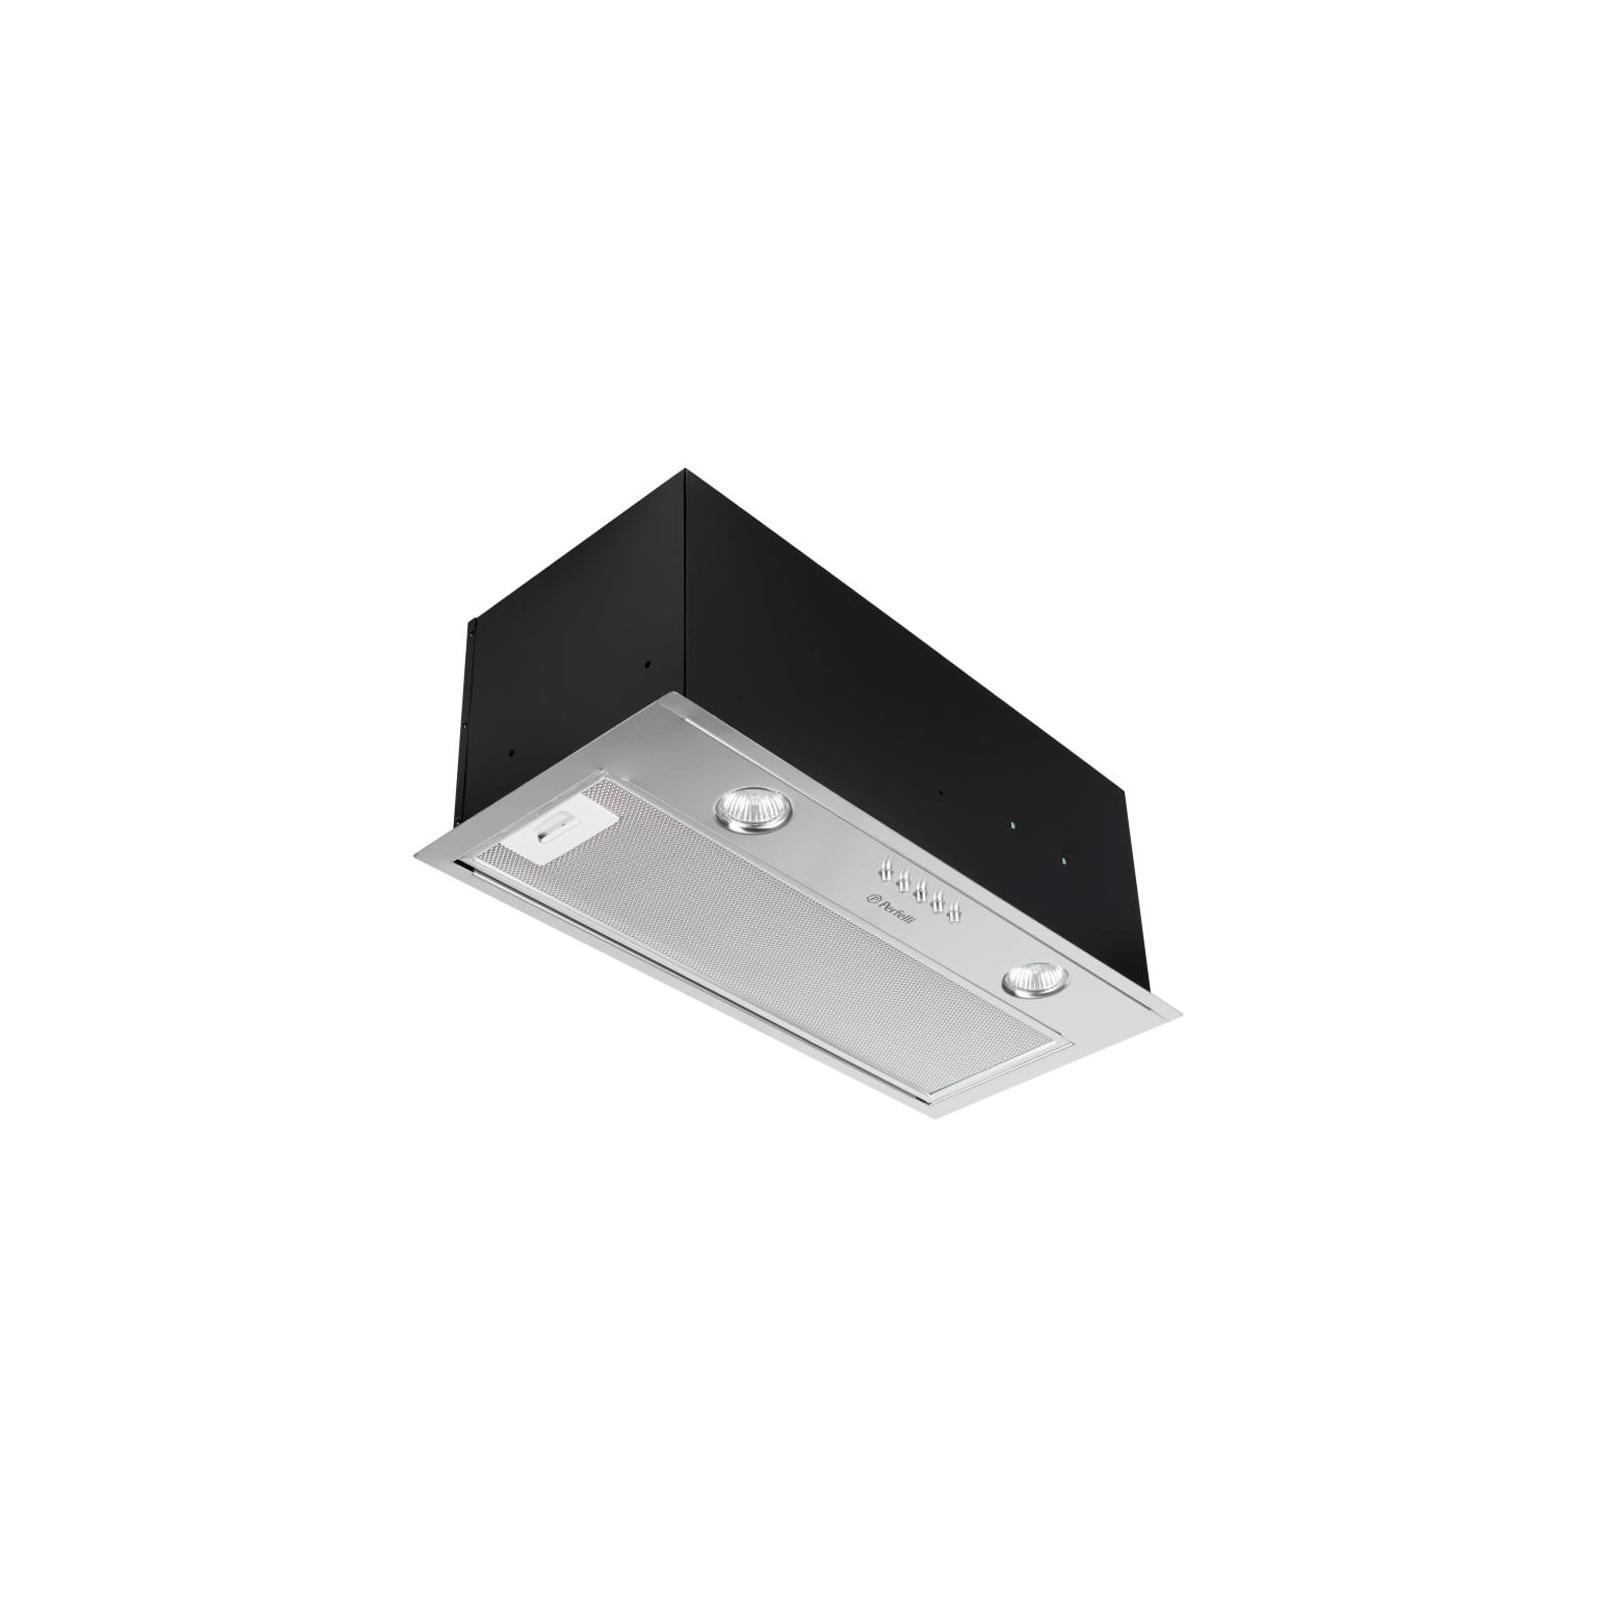 Вытяжка кухонная PERFELLI BI 6511 A 1000 I изображение 2